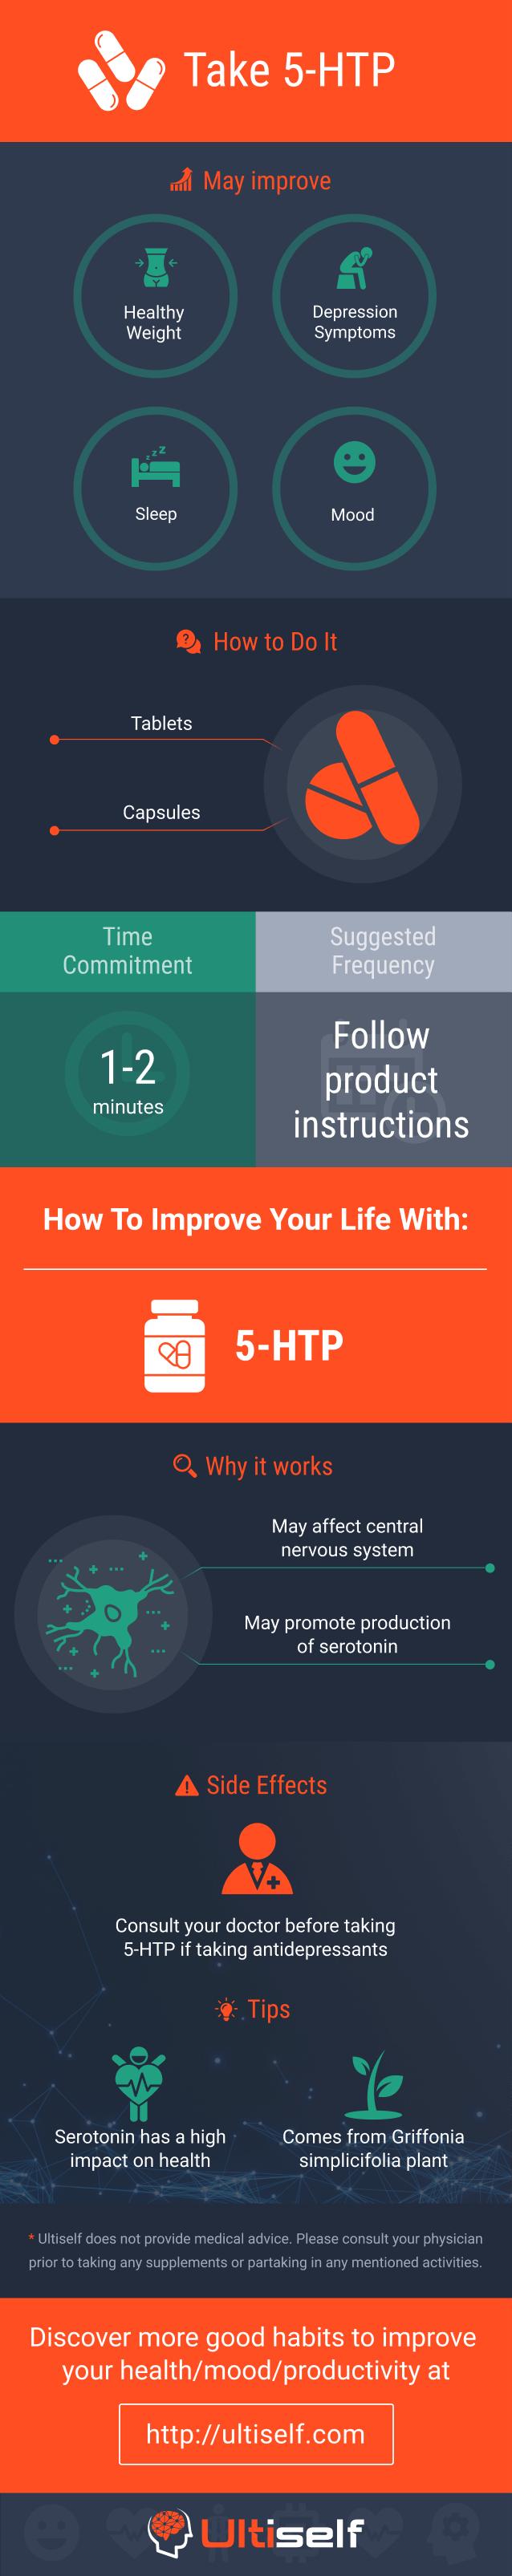 Take 5-HTP infographic